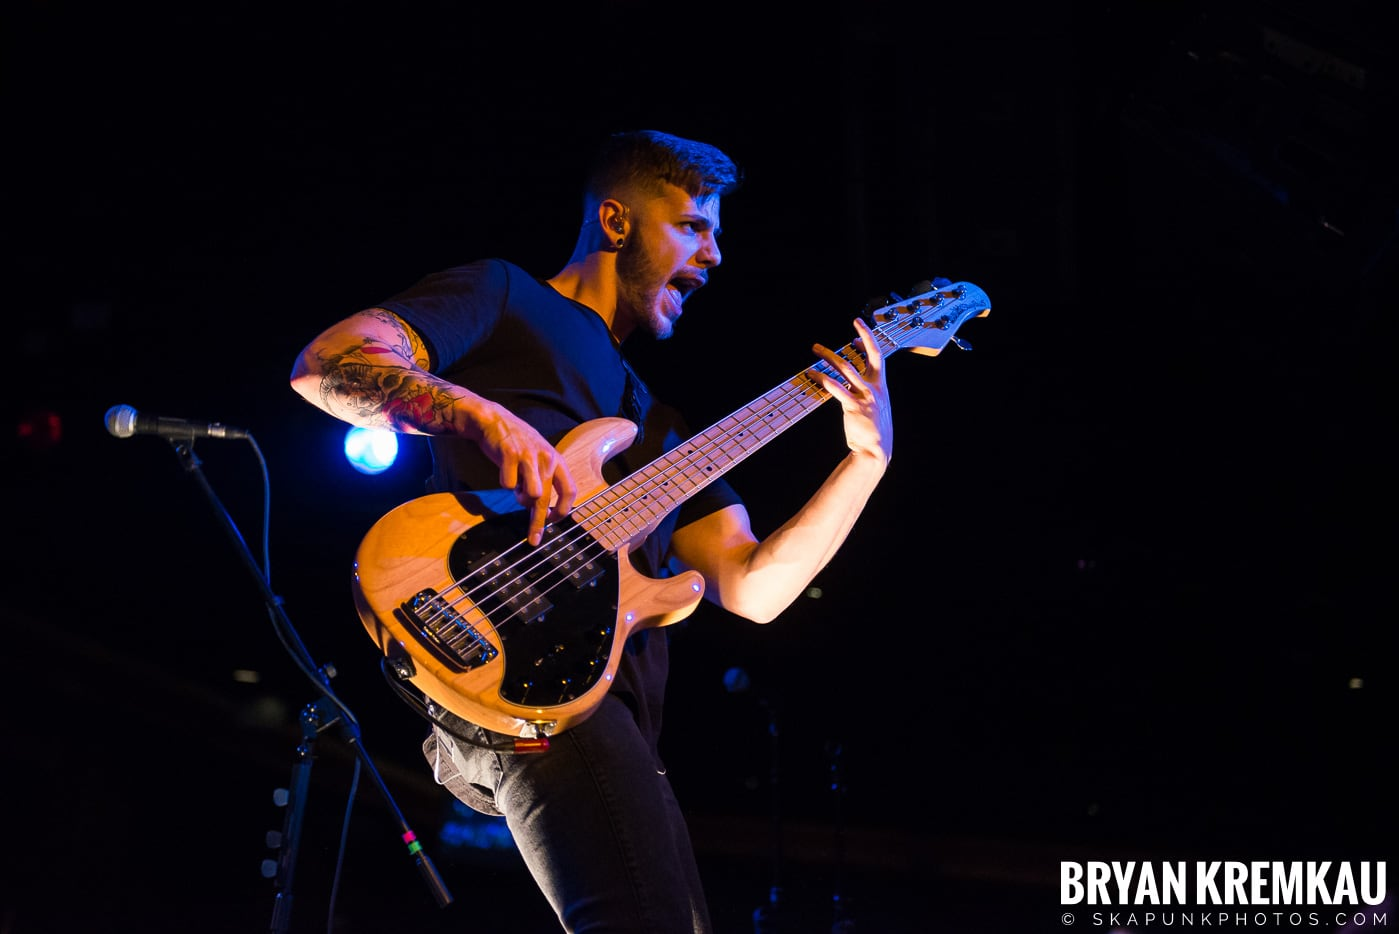 Ballyhoo! @ Starland Ballroom, Sayreville, NJ - 11.23.18 (12)